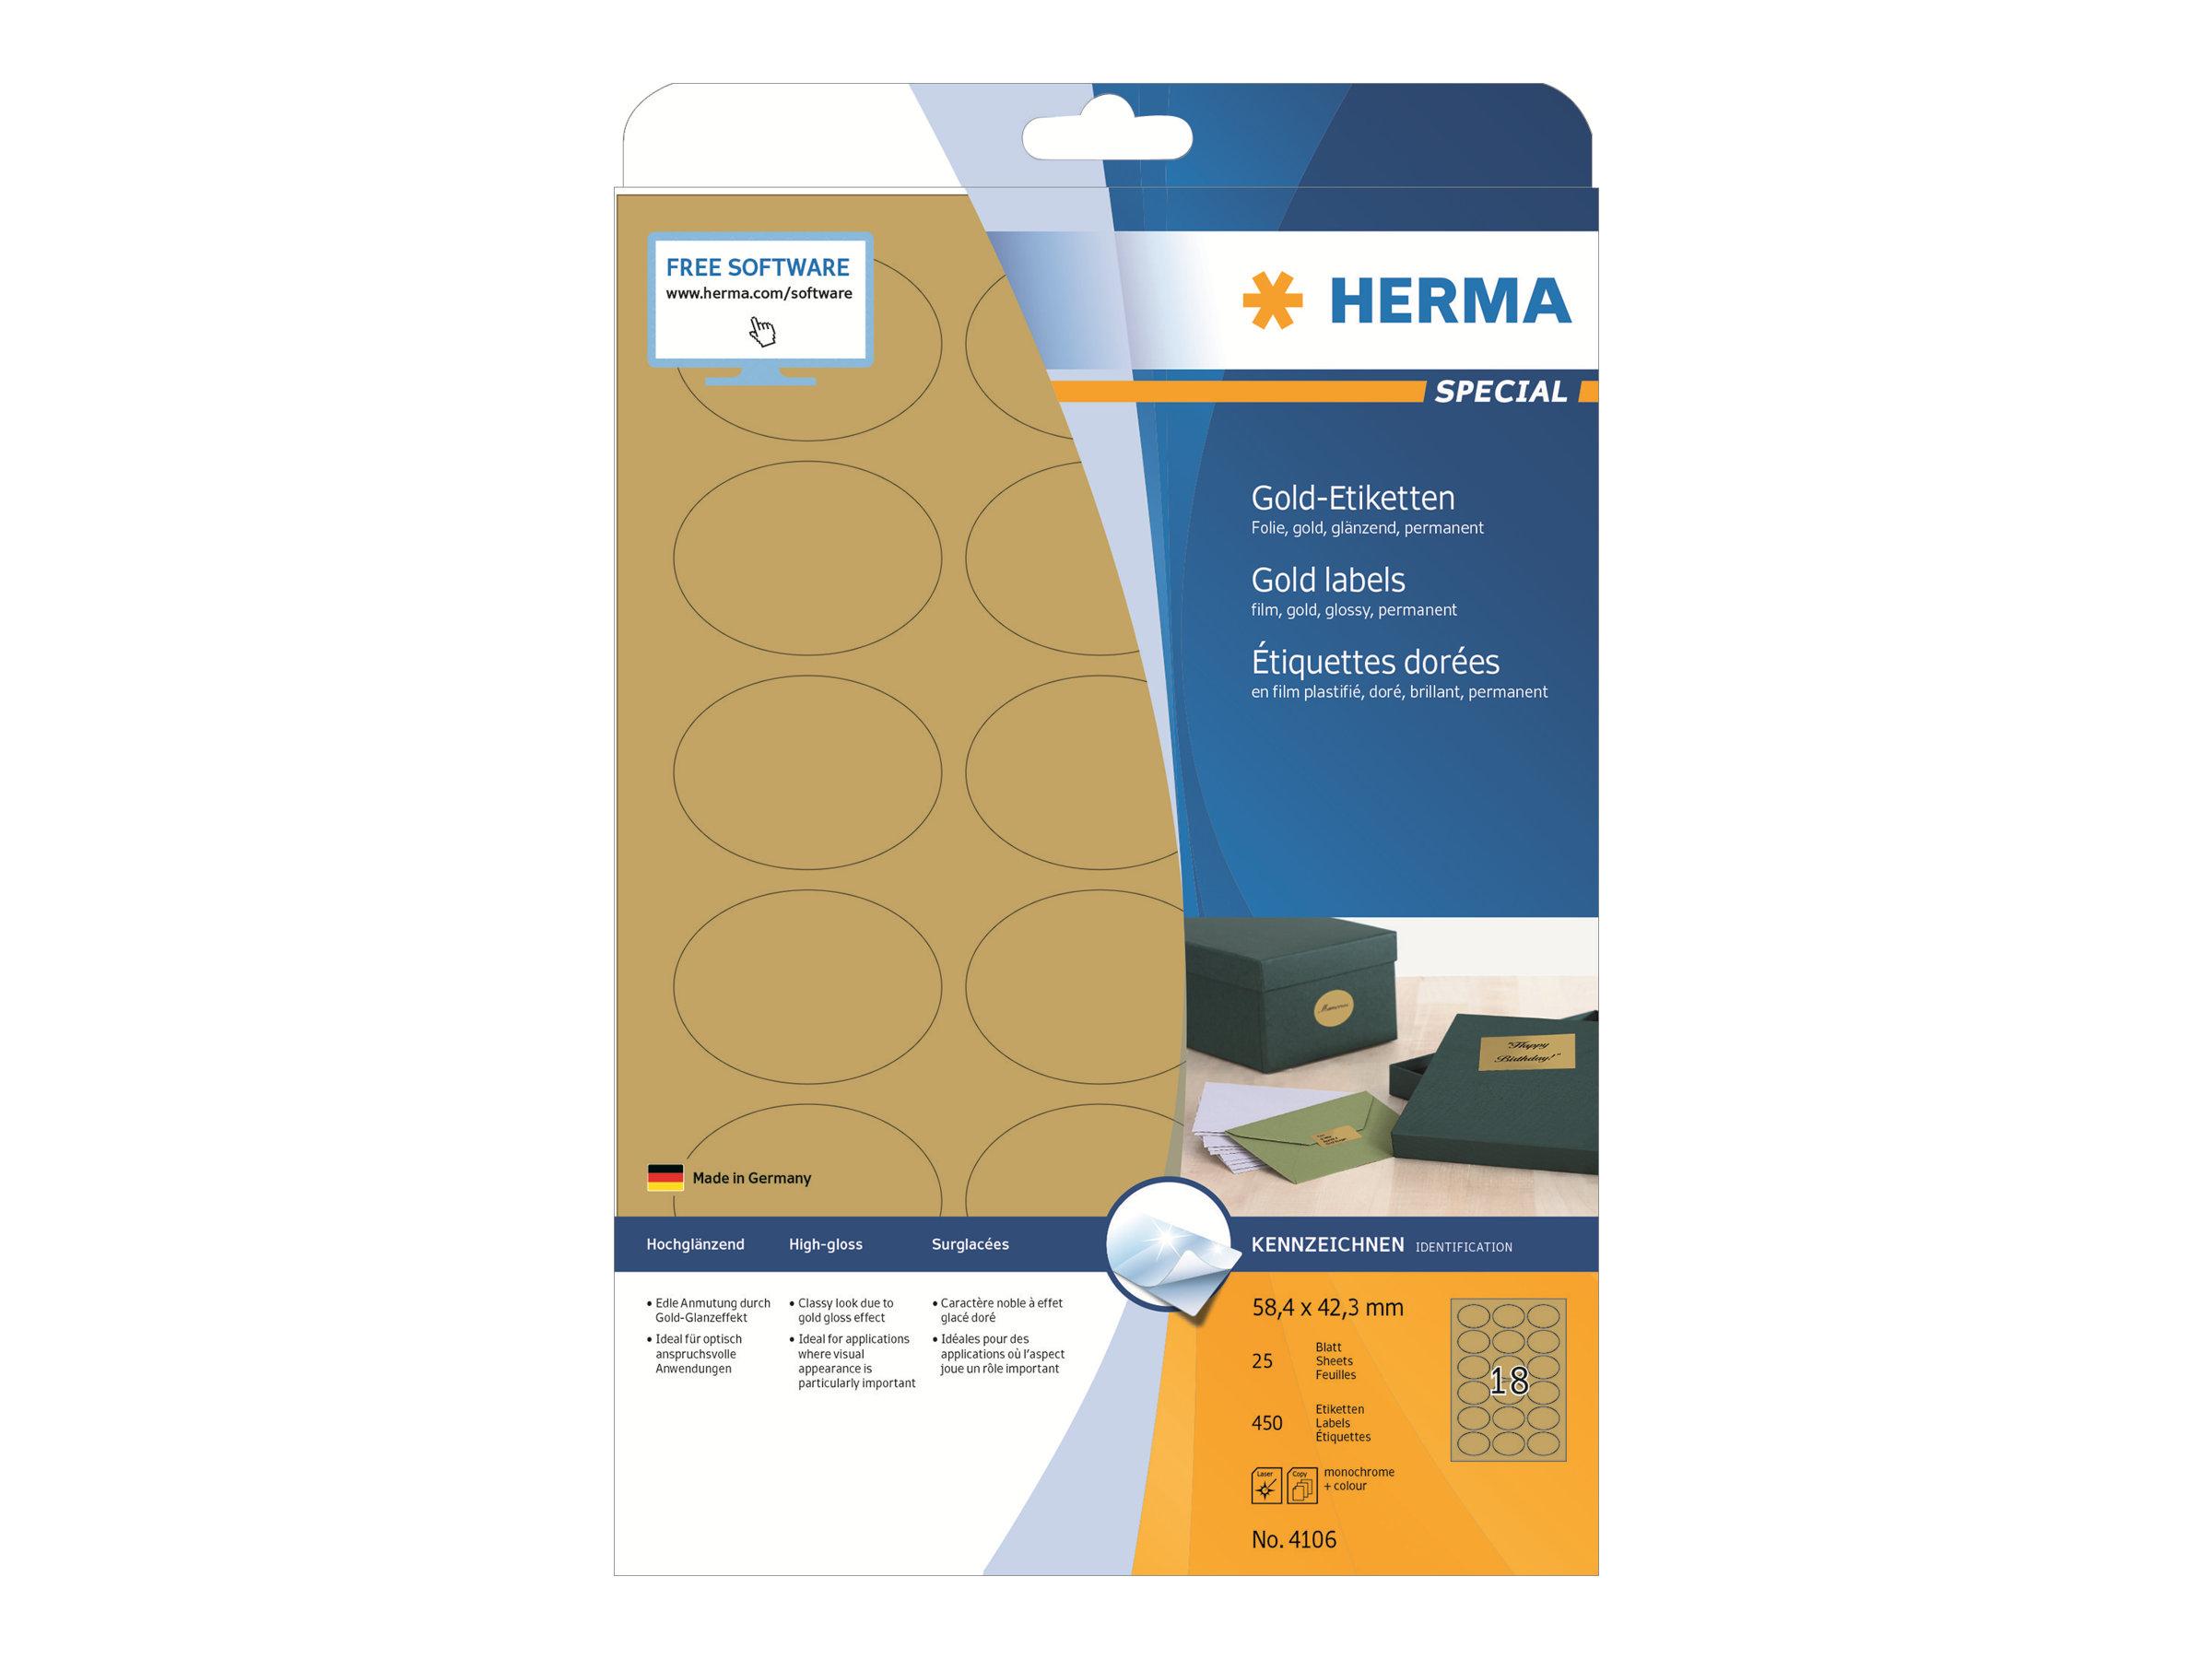 HERMA Special - Polyester - hochglänzend - permanent selbstklebend - Gold - 58,4 x 42,3 mm (oval)